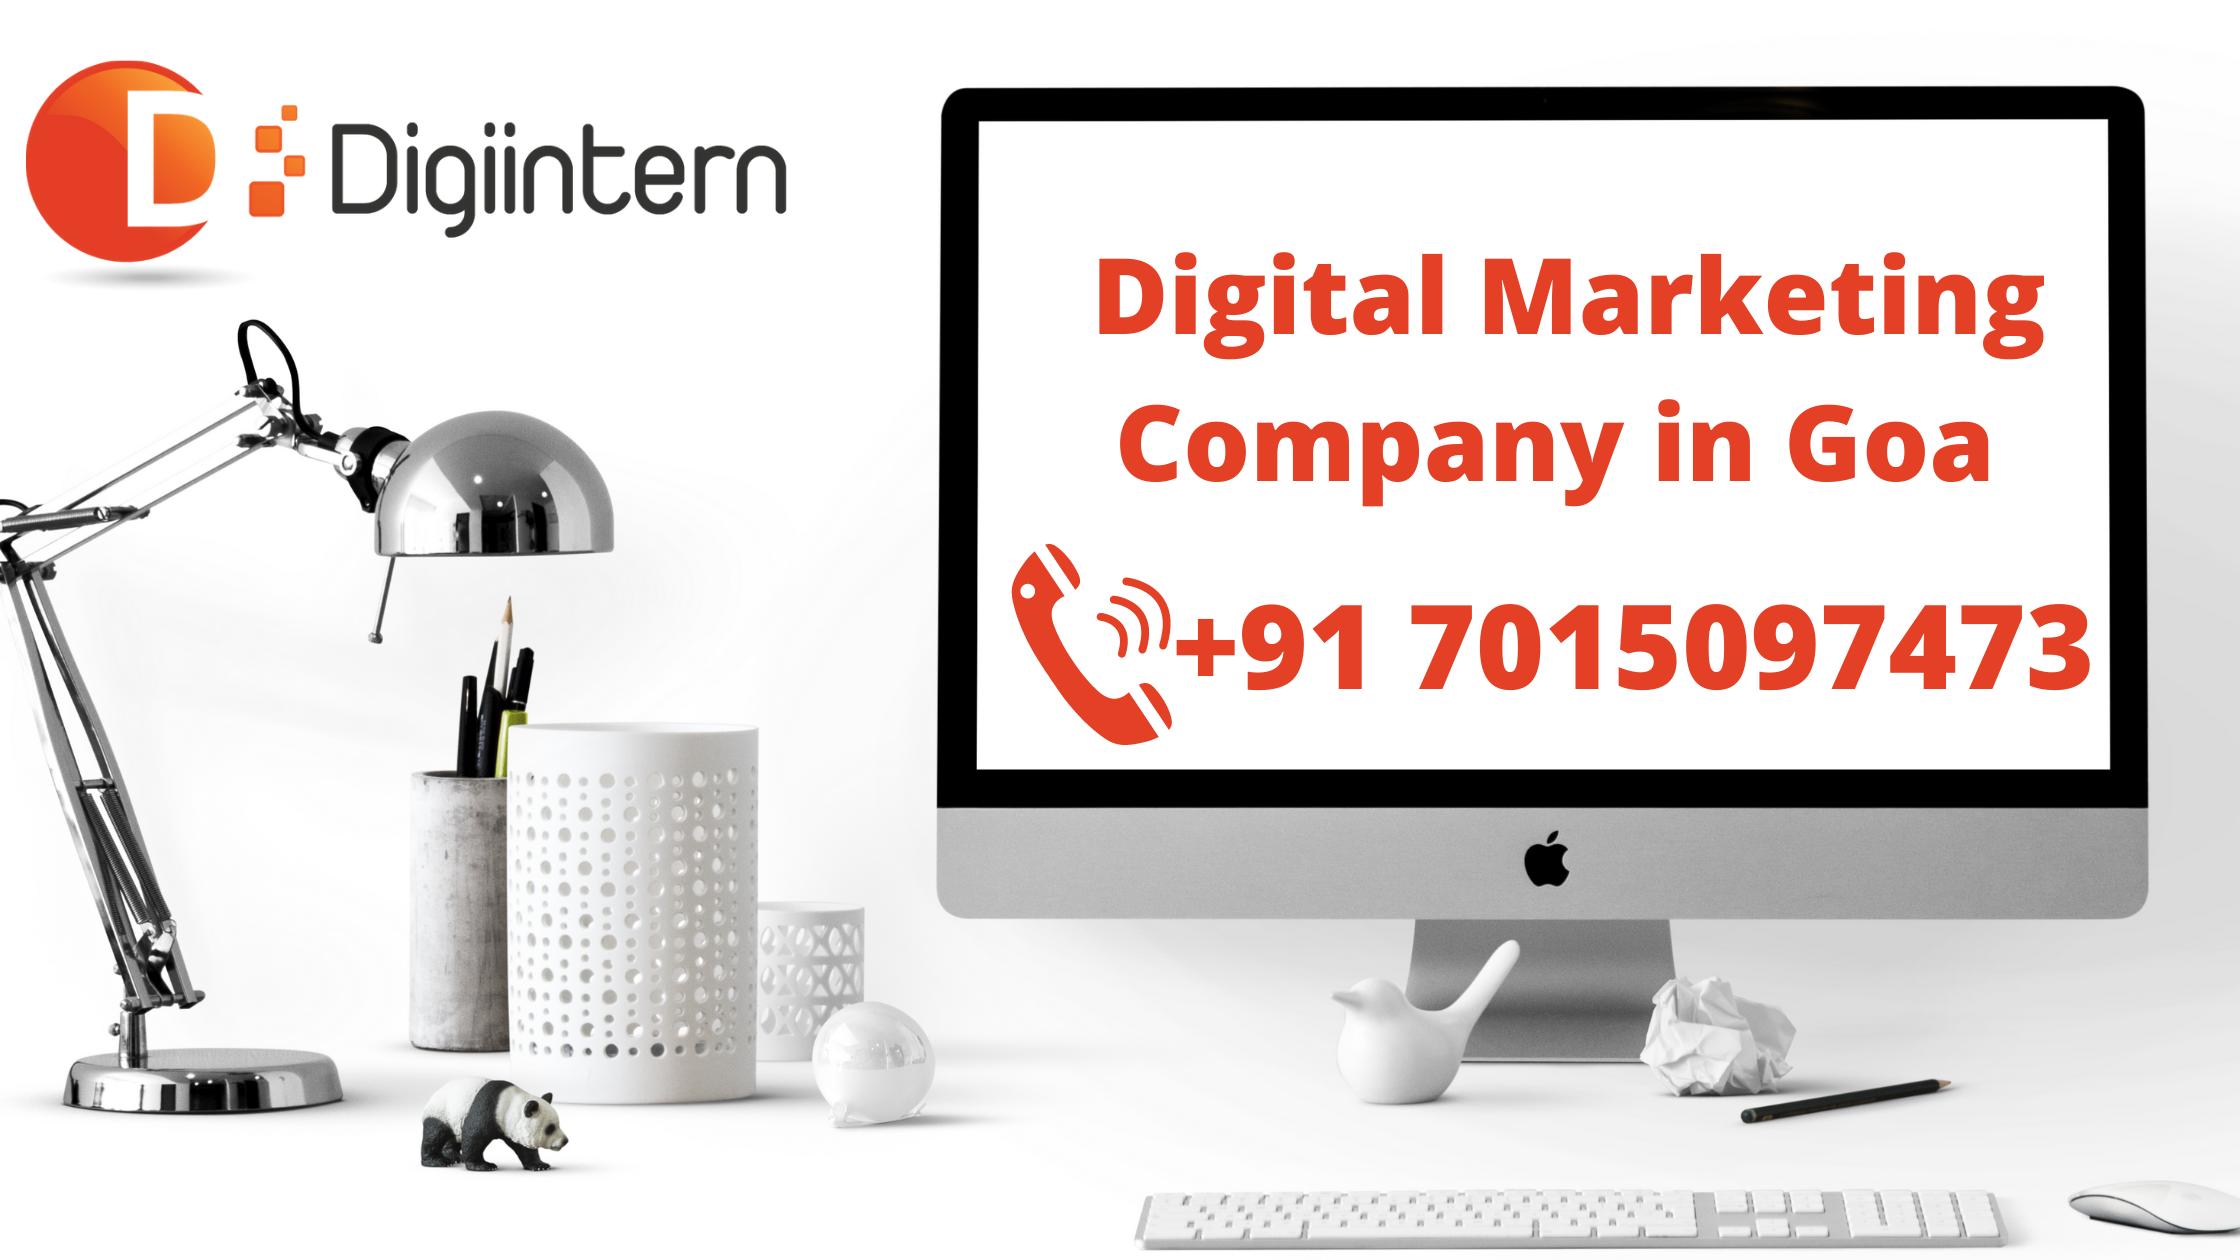 Digital Marketing Company in Goa